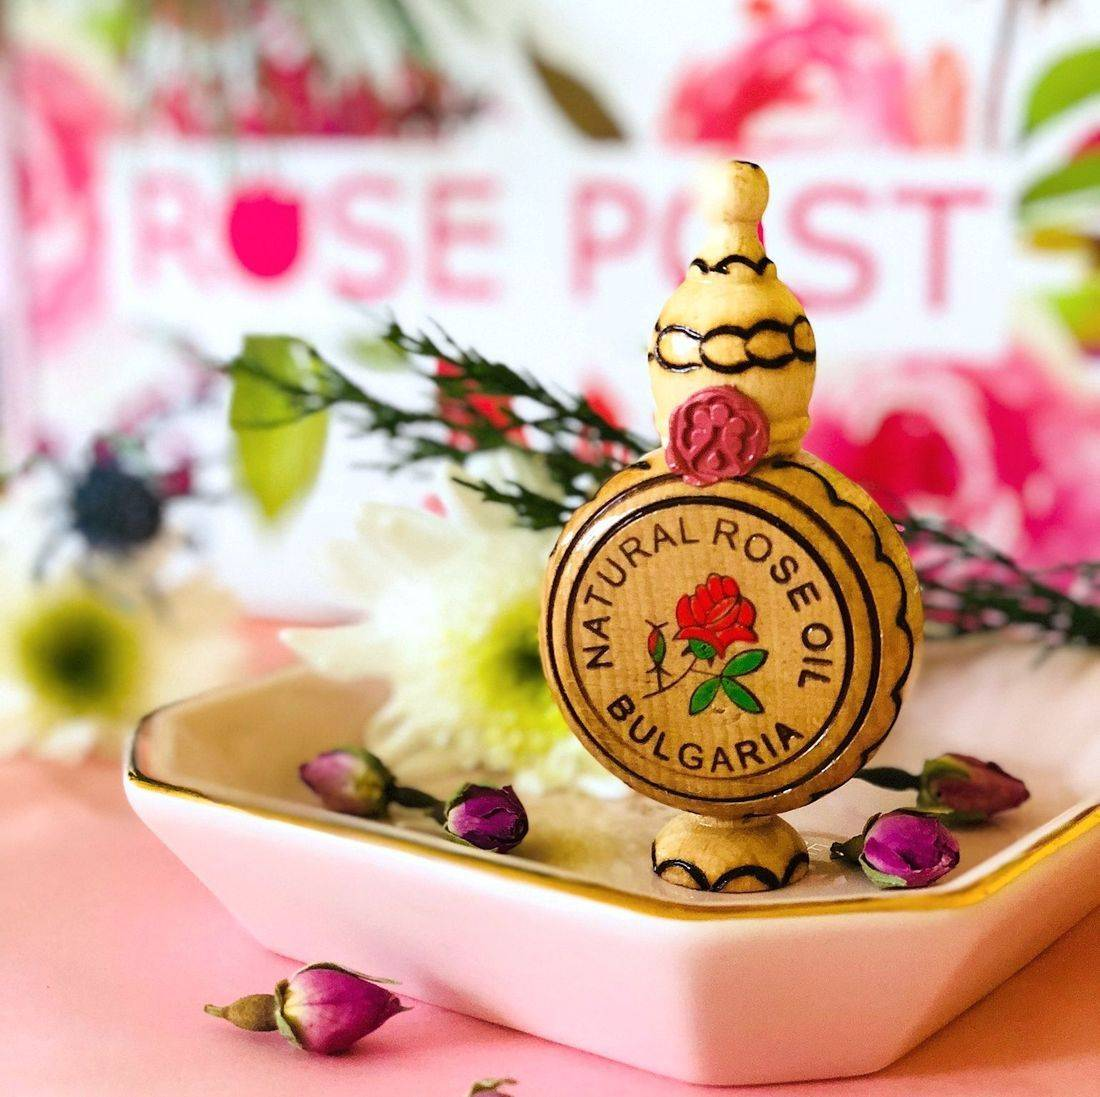 Bulgarian Rose Oil, Bulgarian Rose Otto, RosePost Box, Rose essential oil, Bulgarian Rose Oil, Bulgarian Rose Otto, Clean Rose Beauty